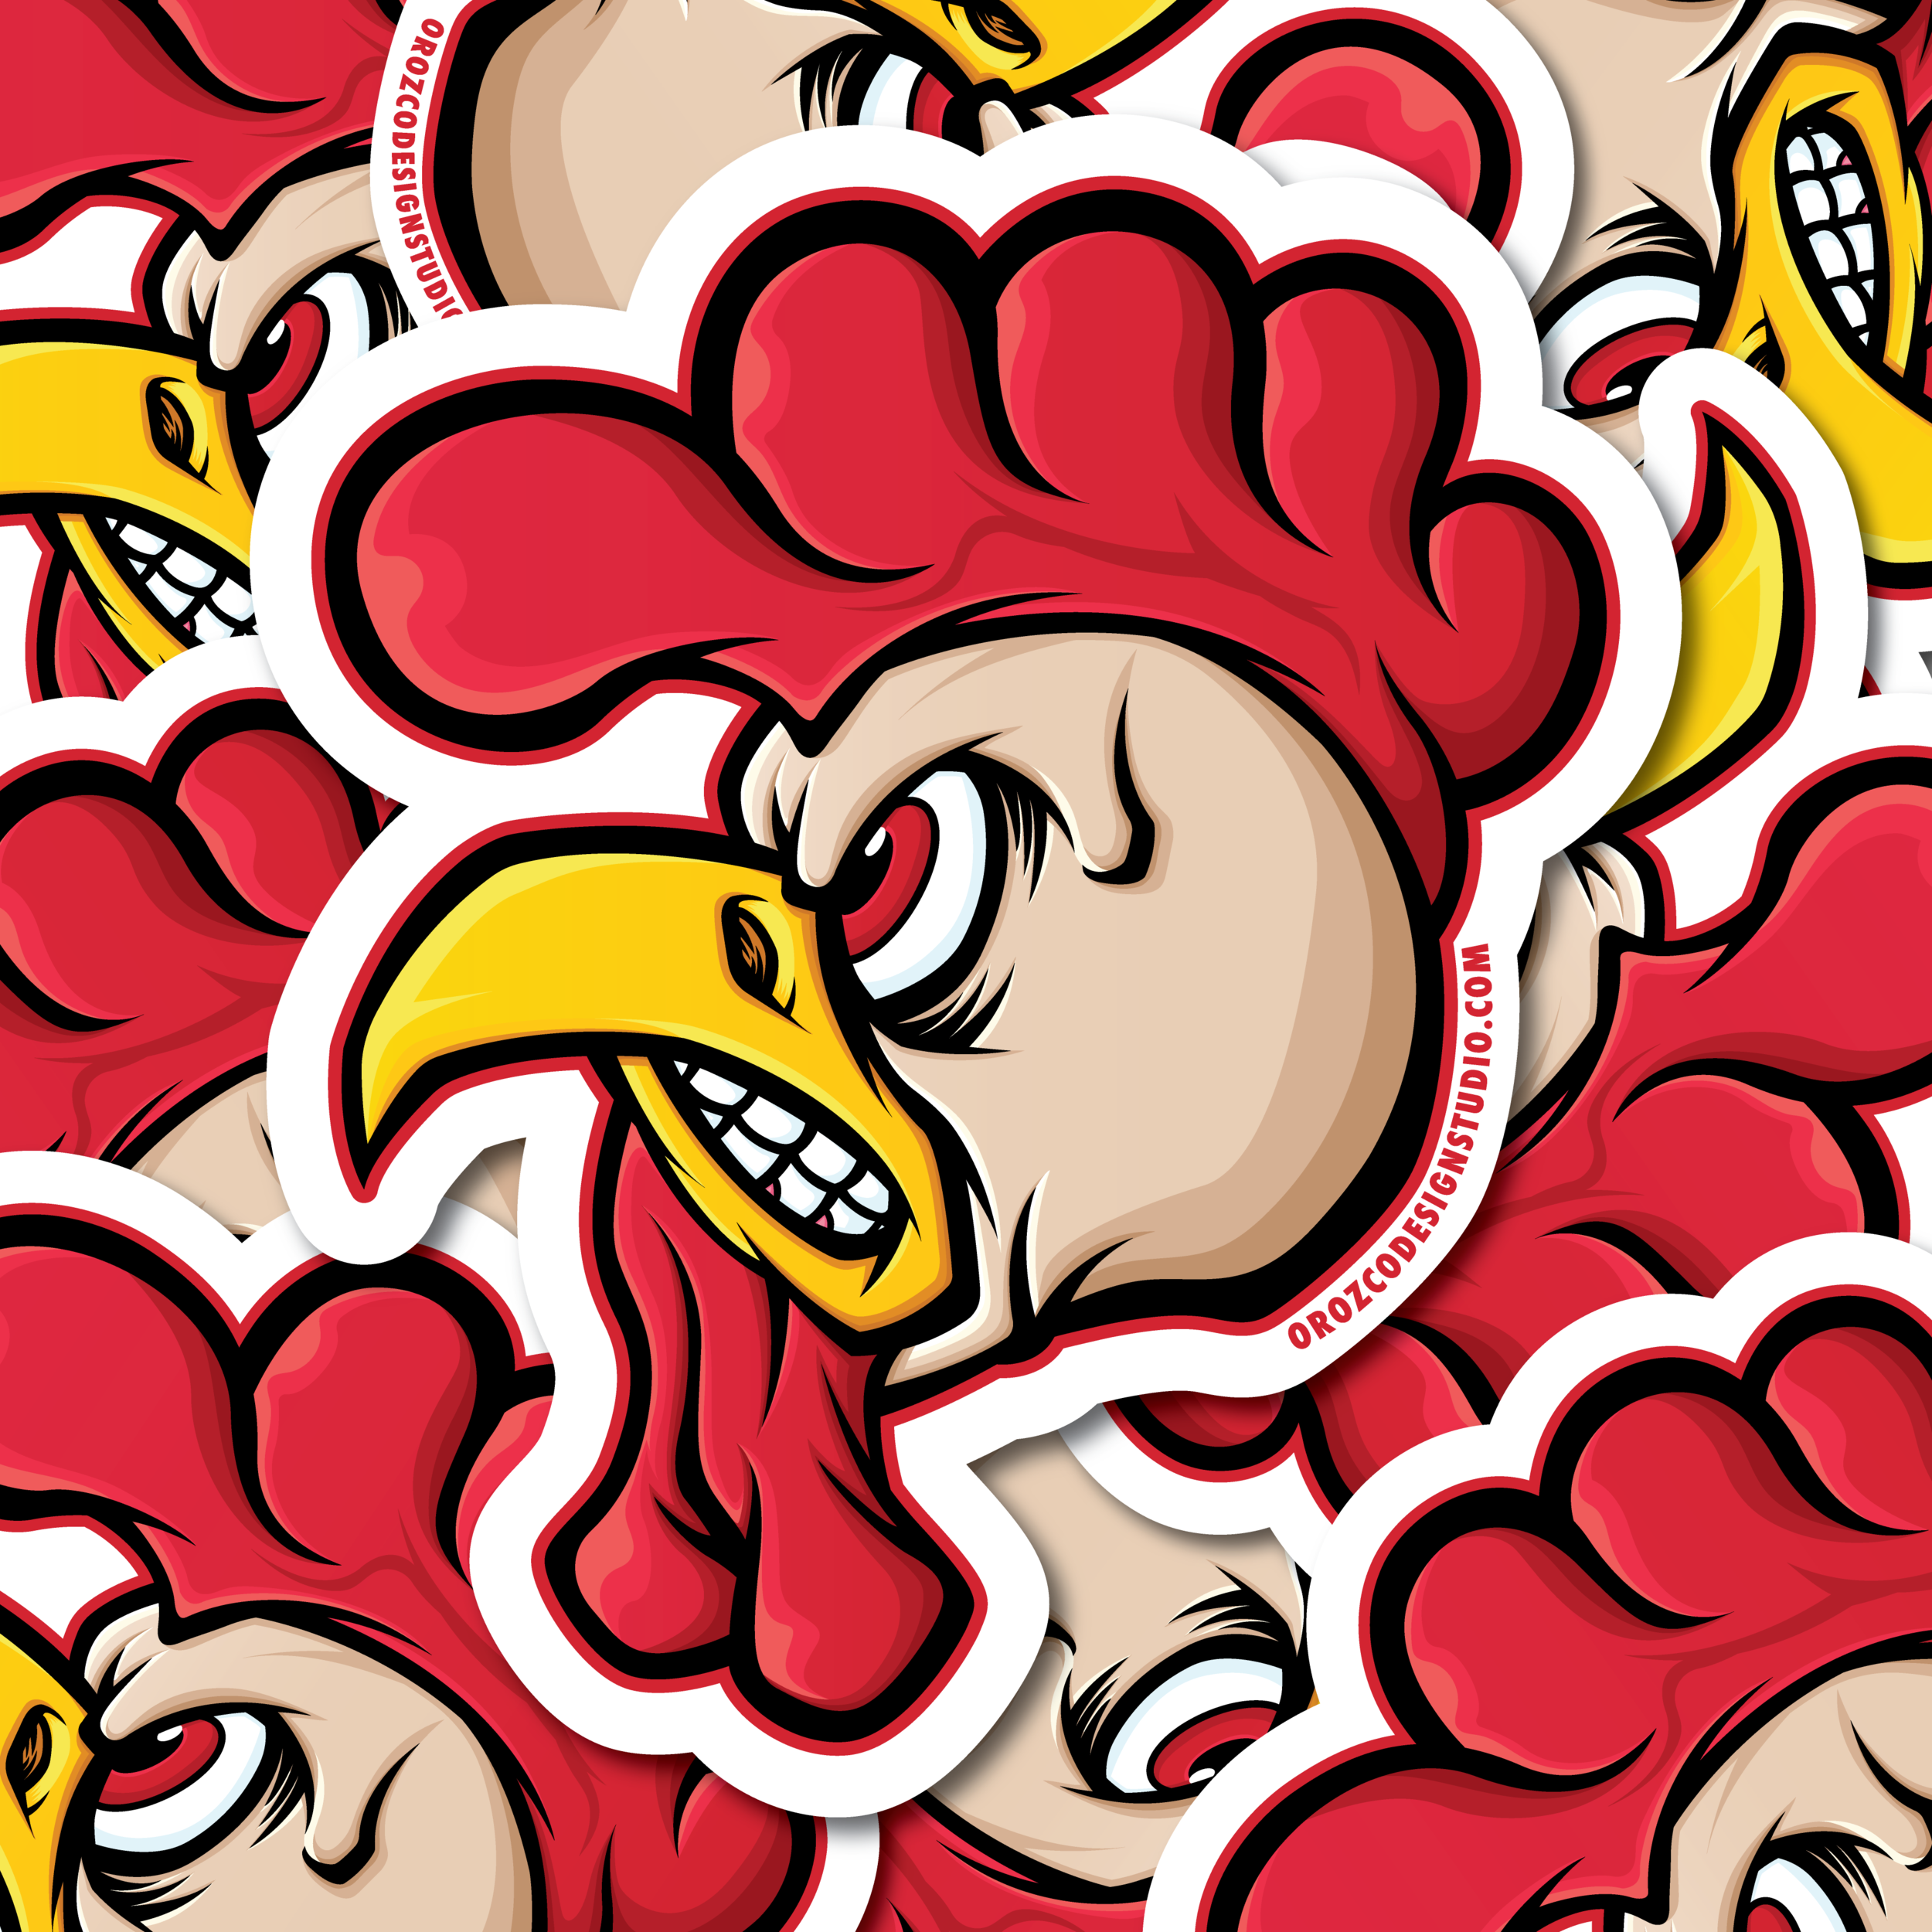 ODS-Rooster-vector-illustration-illustrator-sticker-art-roberto-orozco-artist-orozcodesign-stickers.jpg